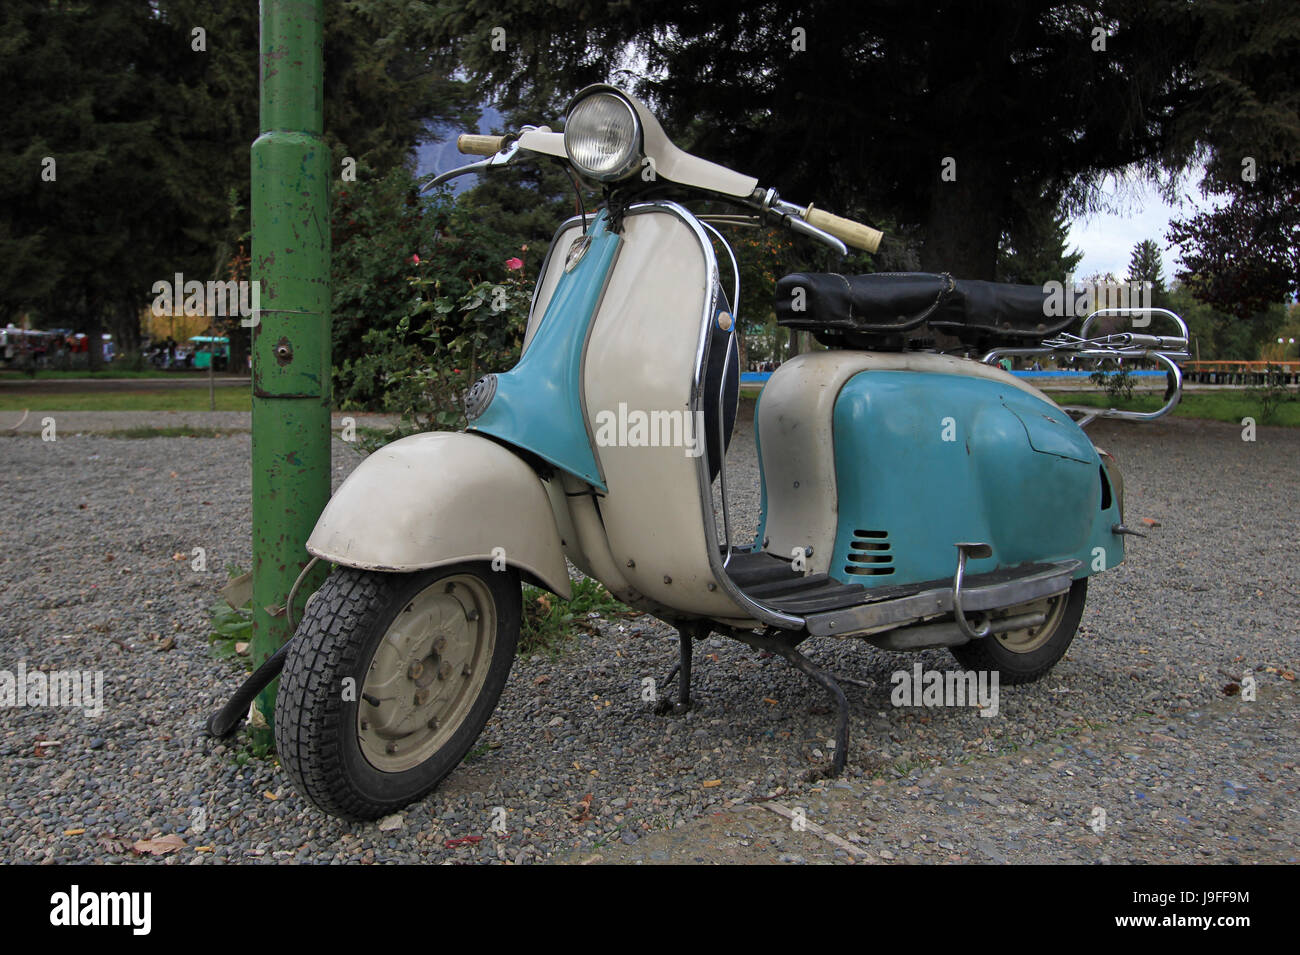 Blue Vintage scooter in El Bolson, Argentina Foto Stock